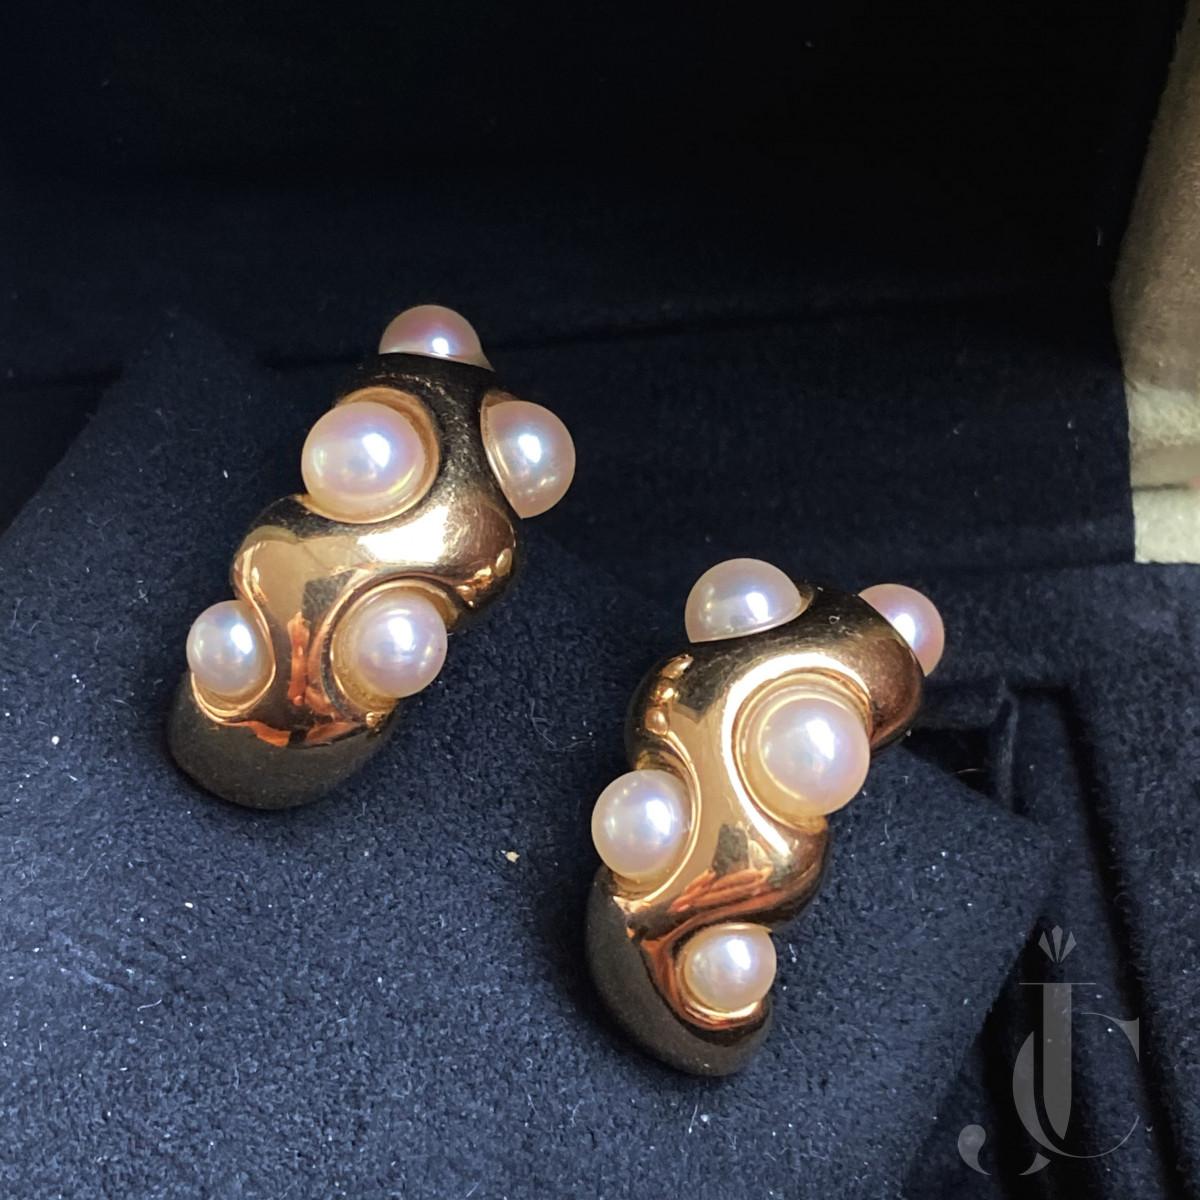 Van Cleef and Arpels ear clips